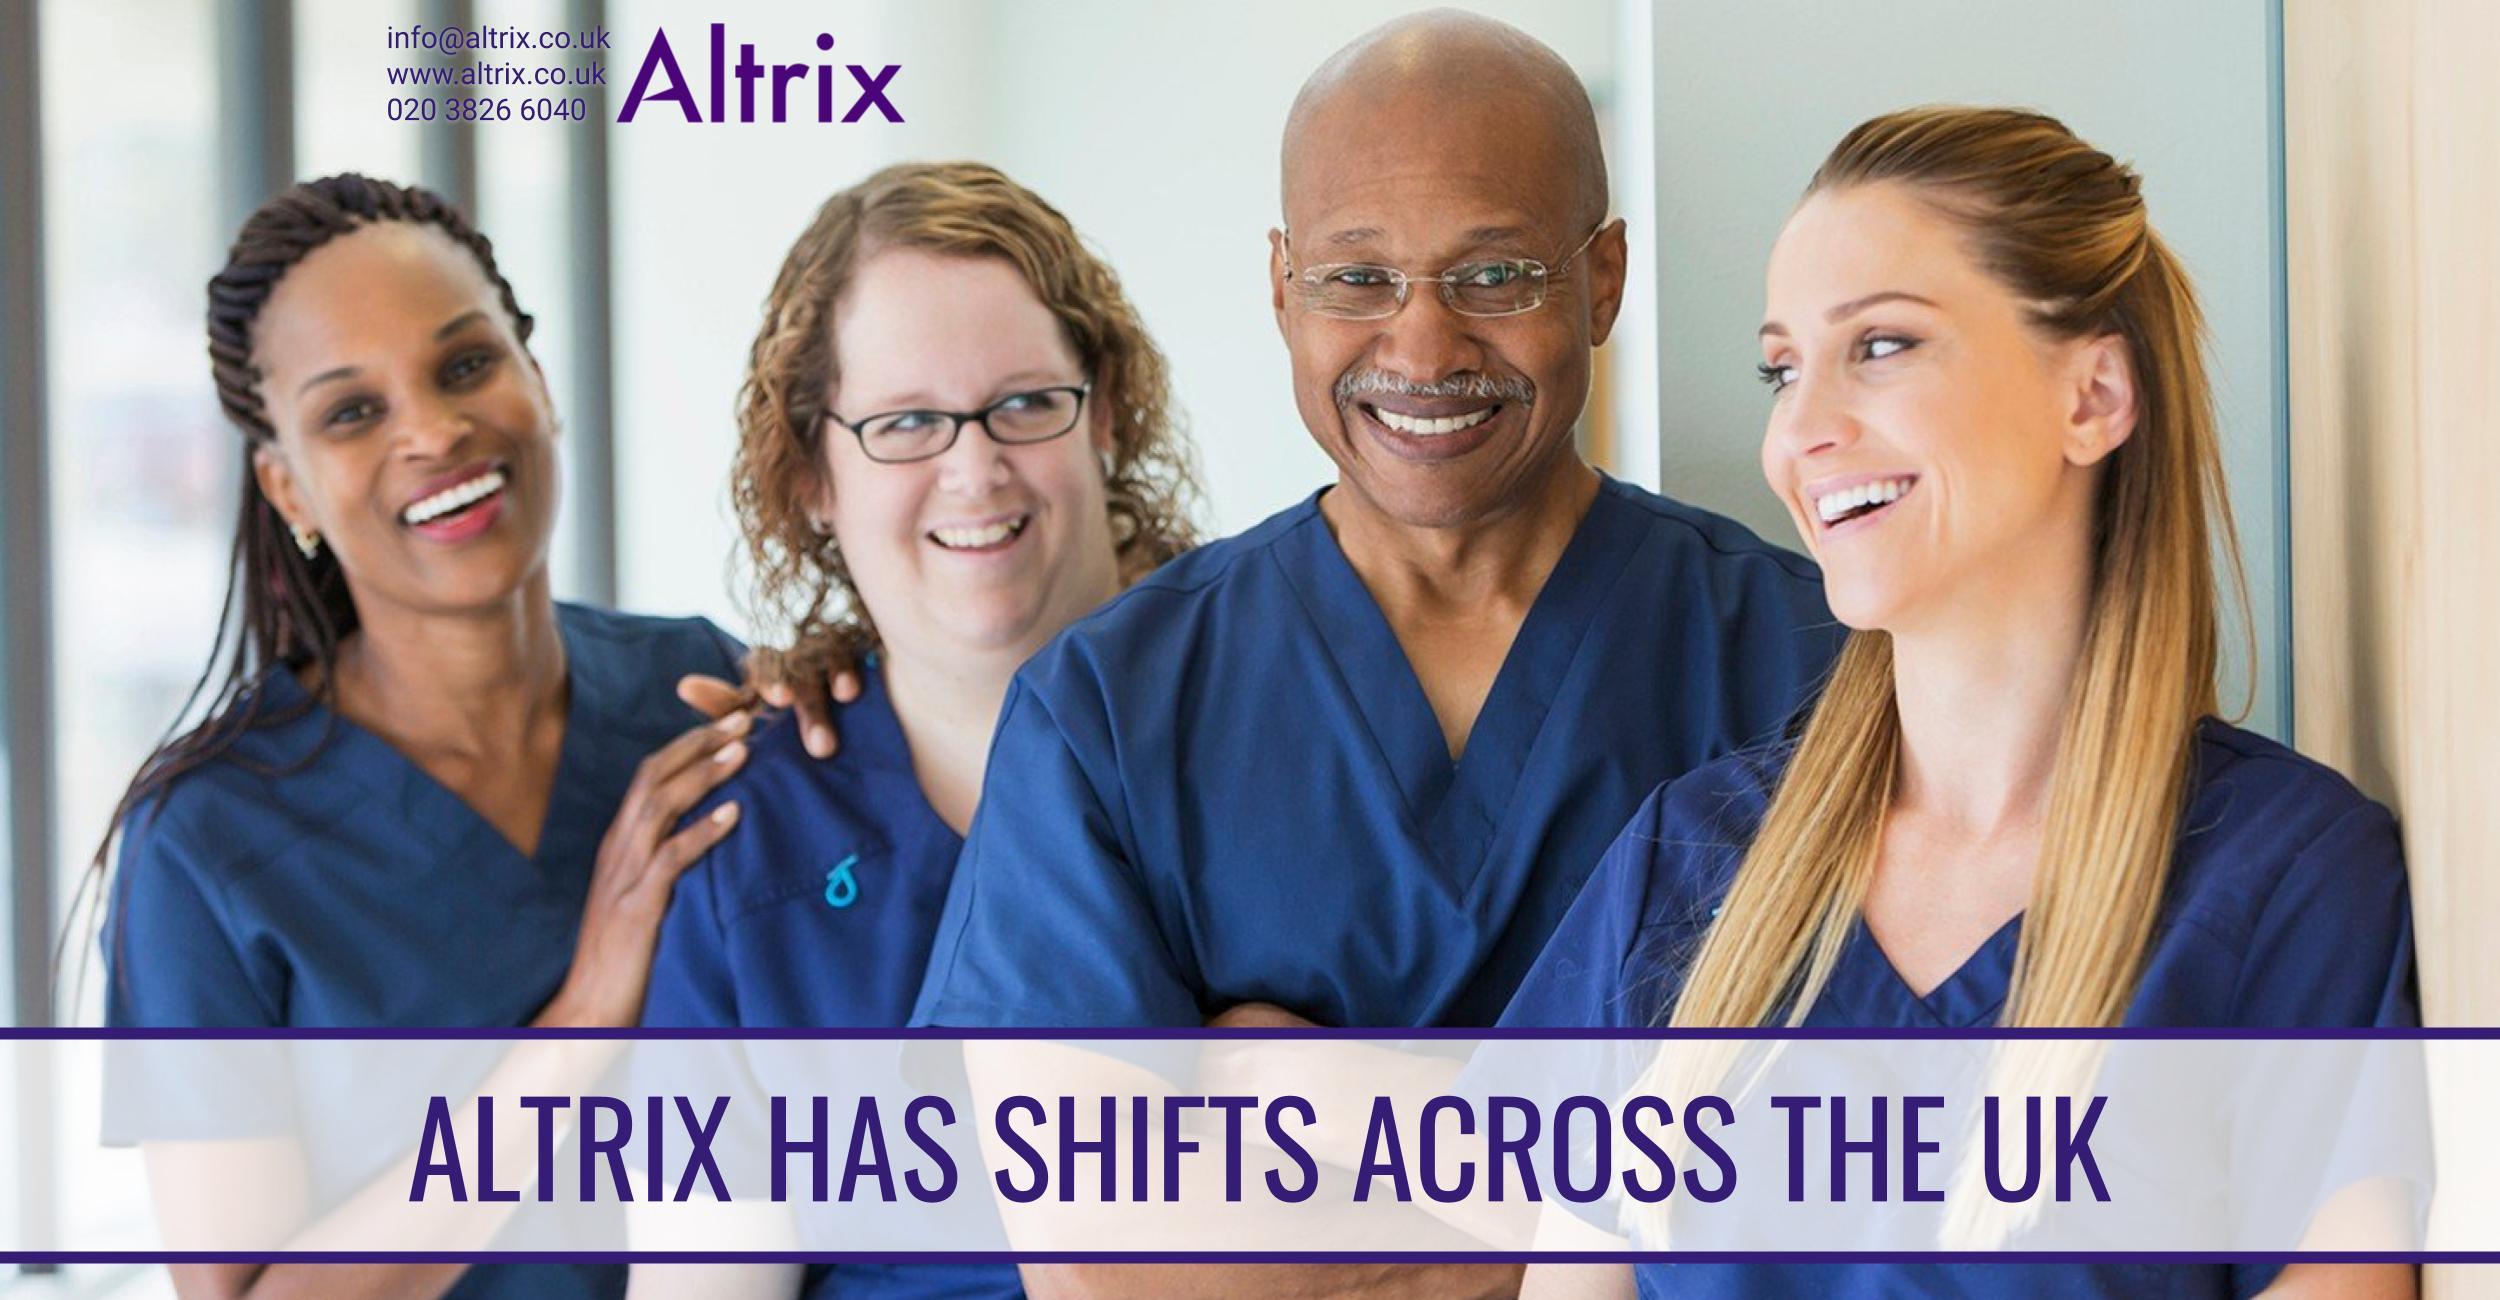 nursing shifts across the uk